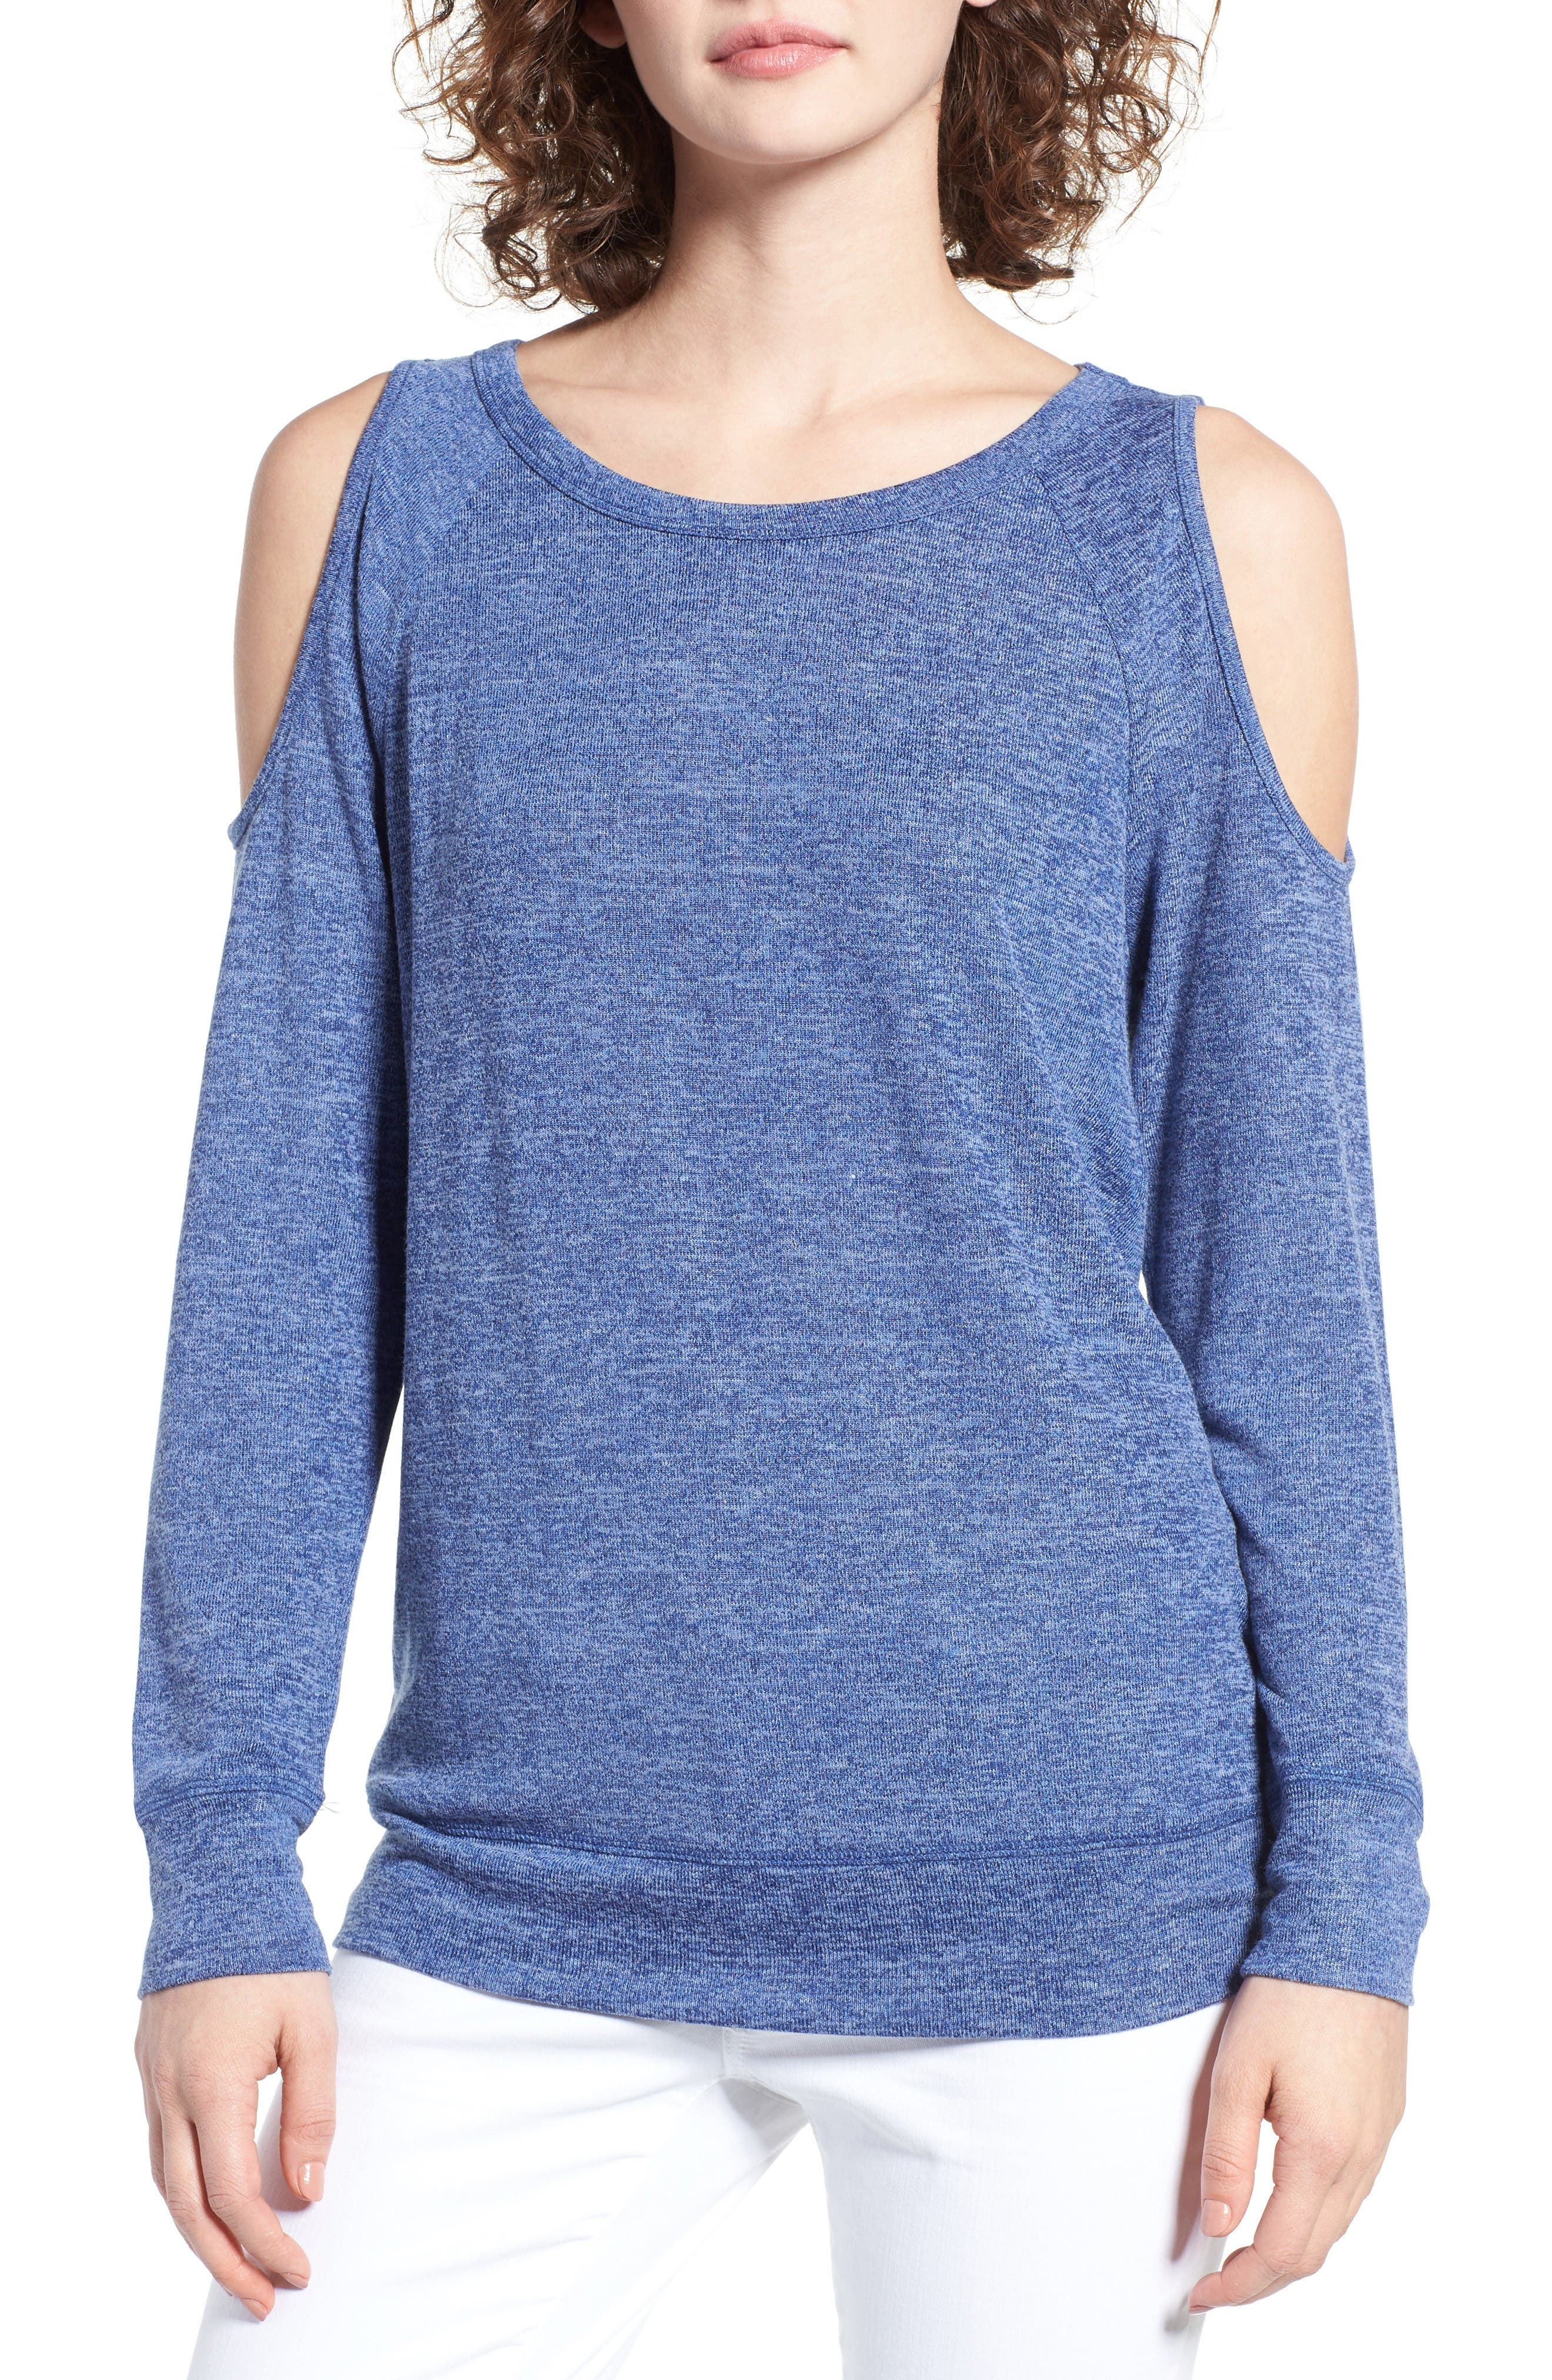 Alternate Image 1 Selected - BP. Cold Shoulder Sweatshirt